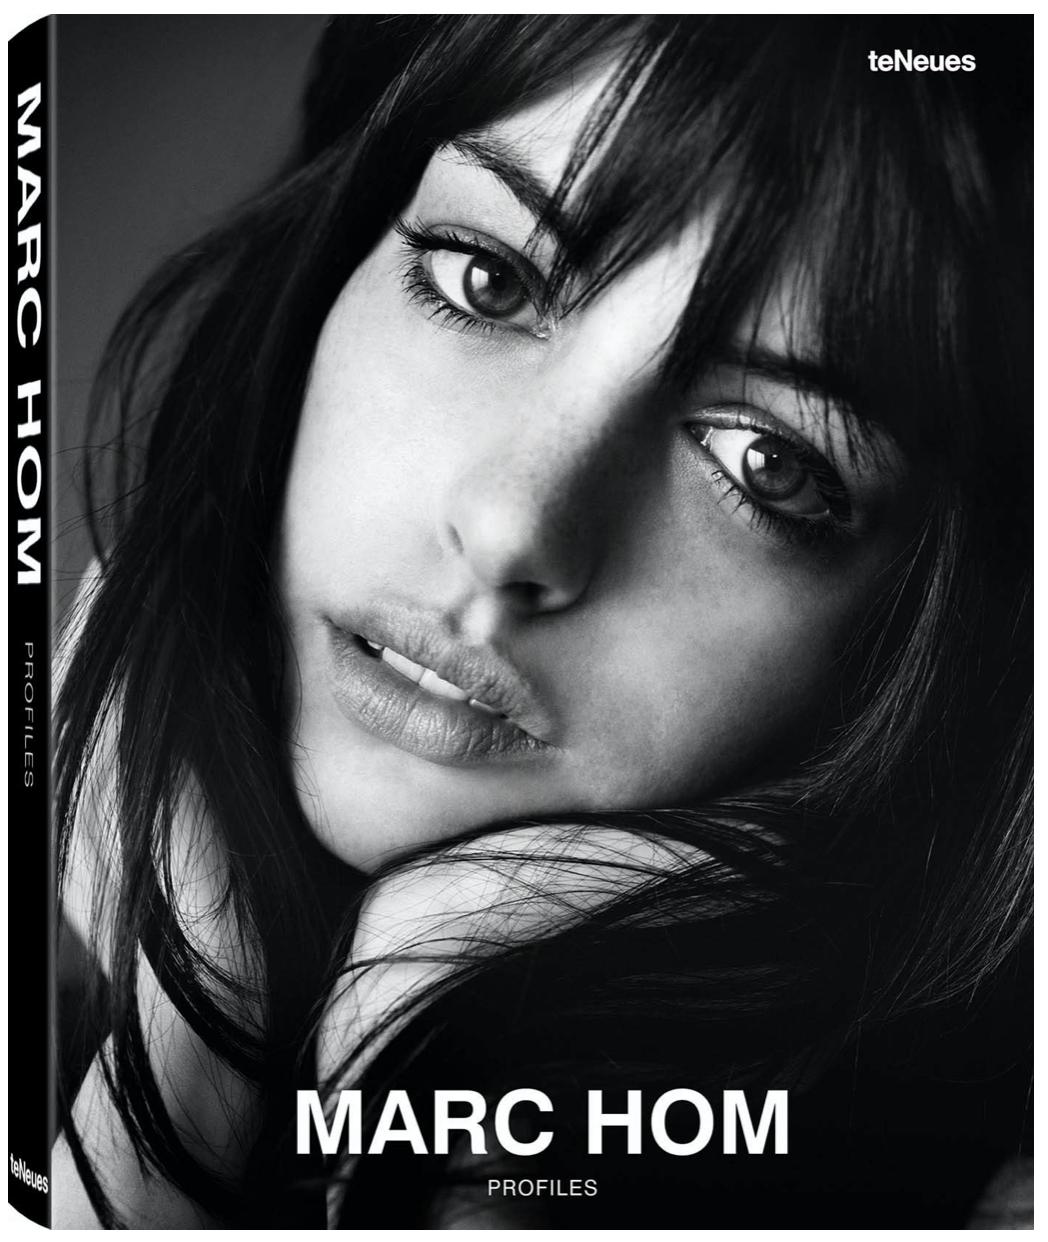 Marc Hom Profiles